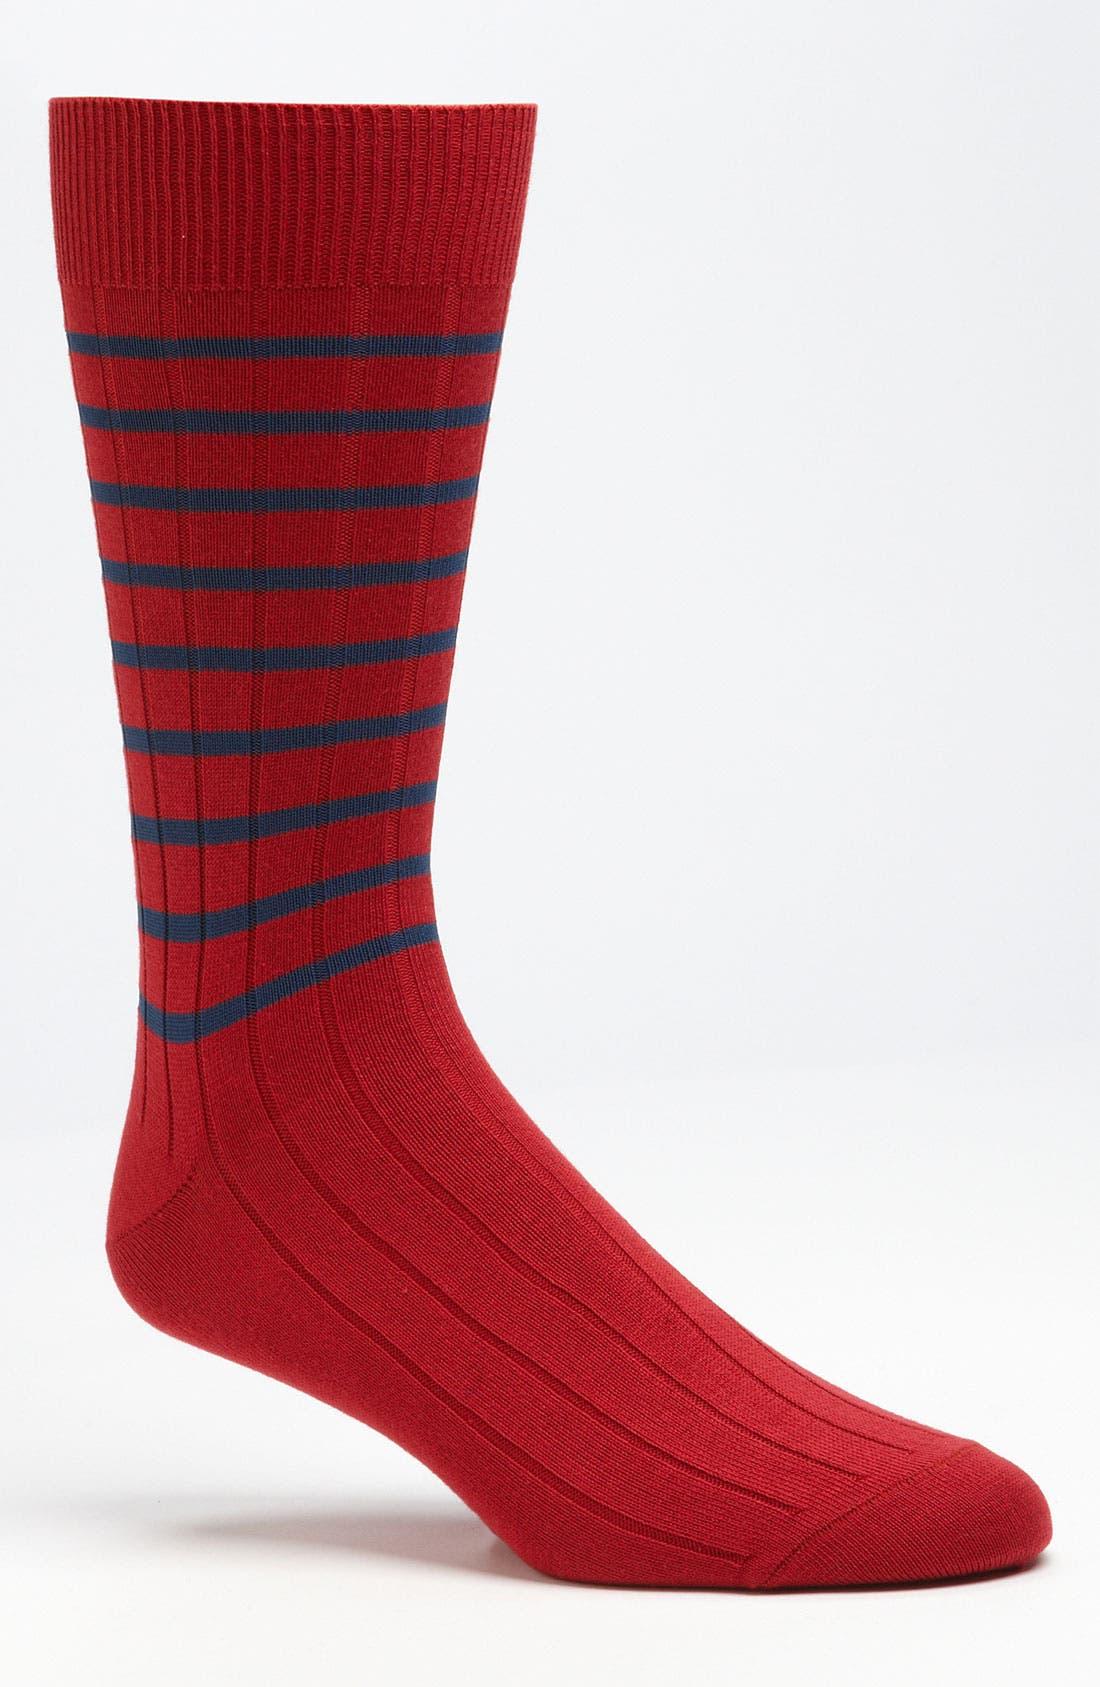 Alternate Image 1 Selected - Marcoliani Pima Cotton Socks